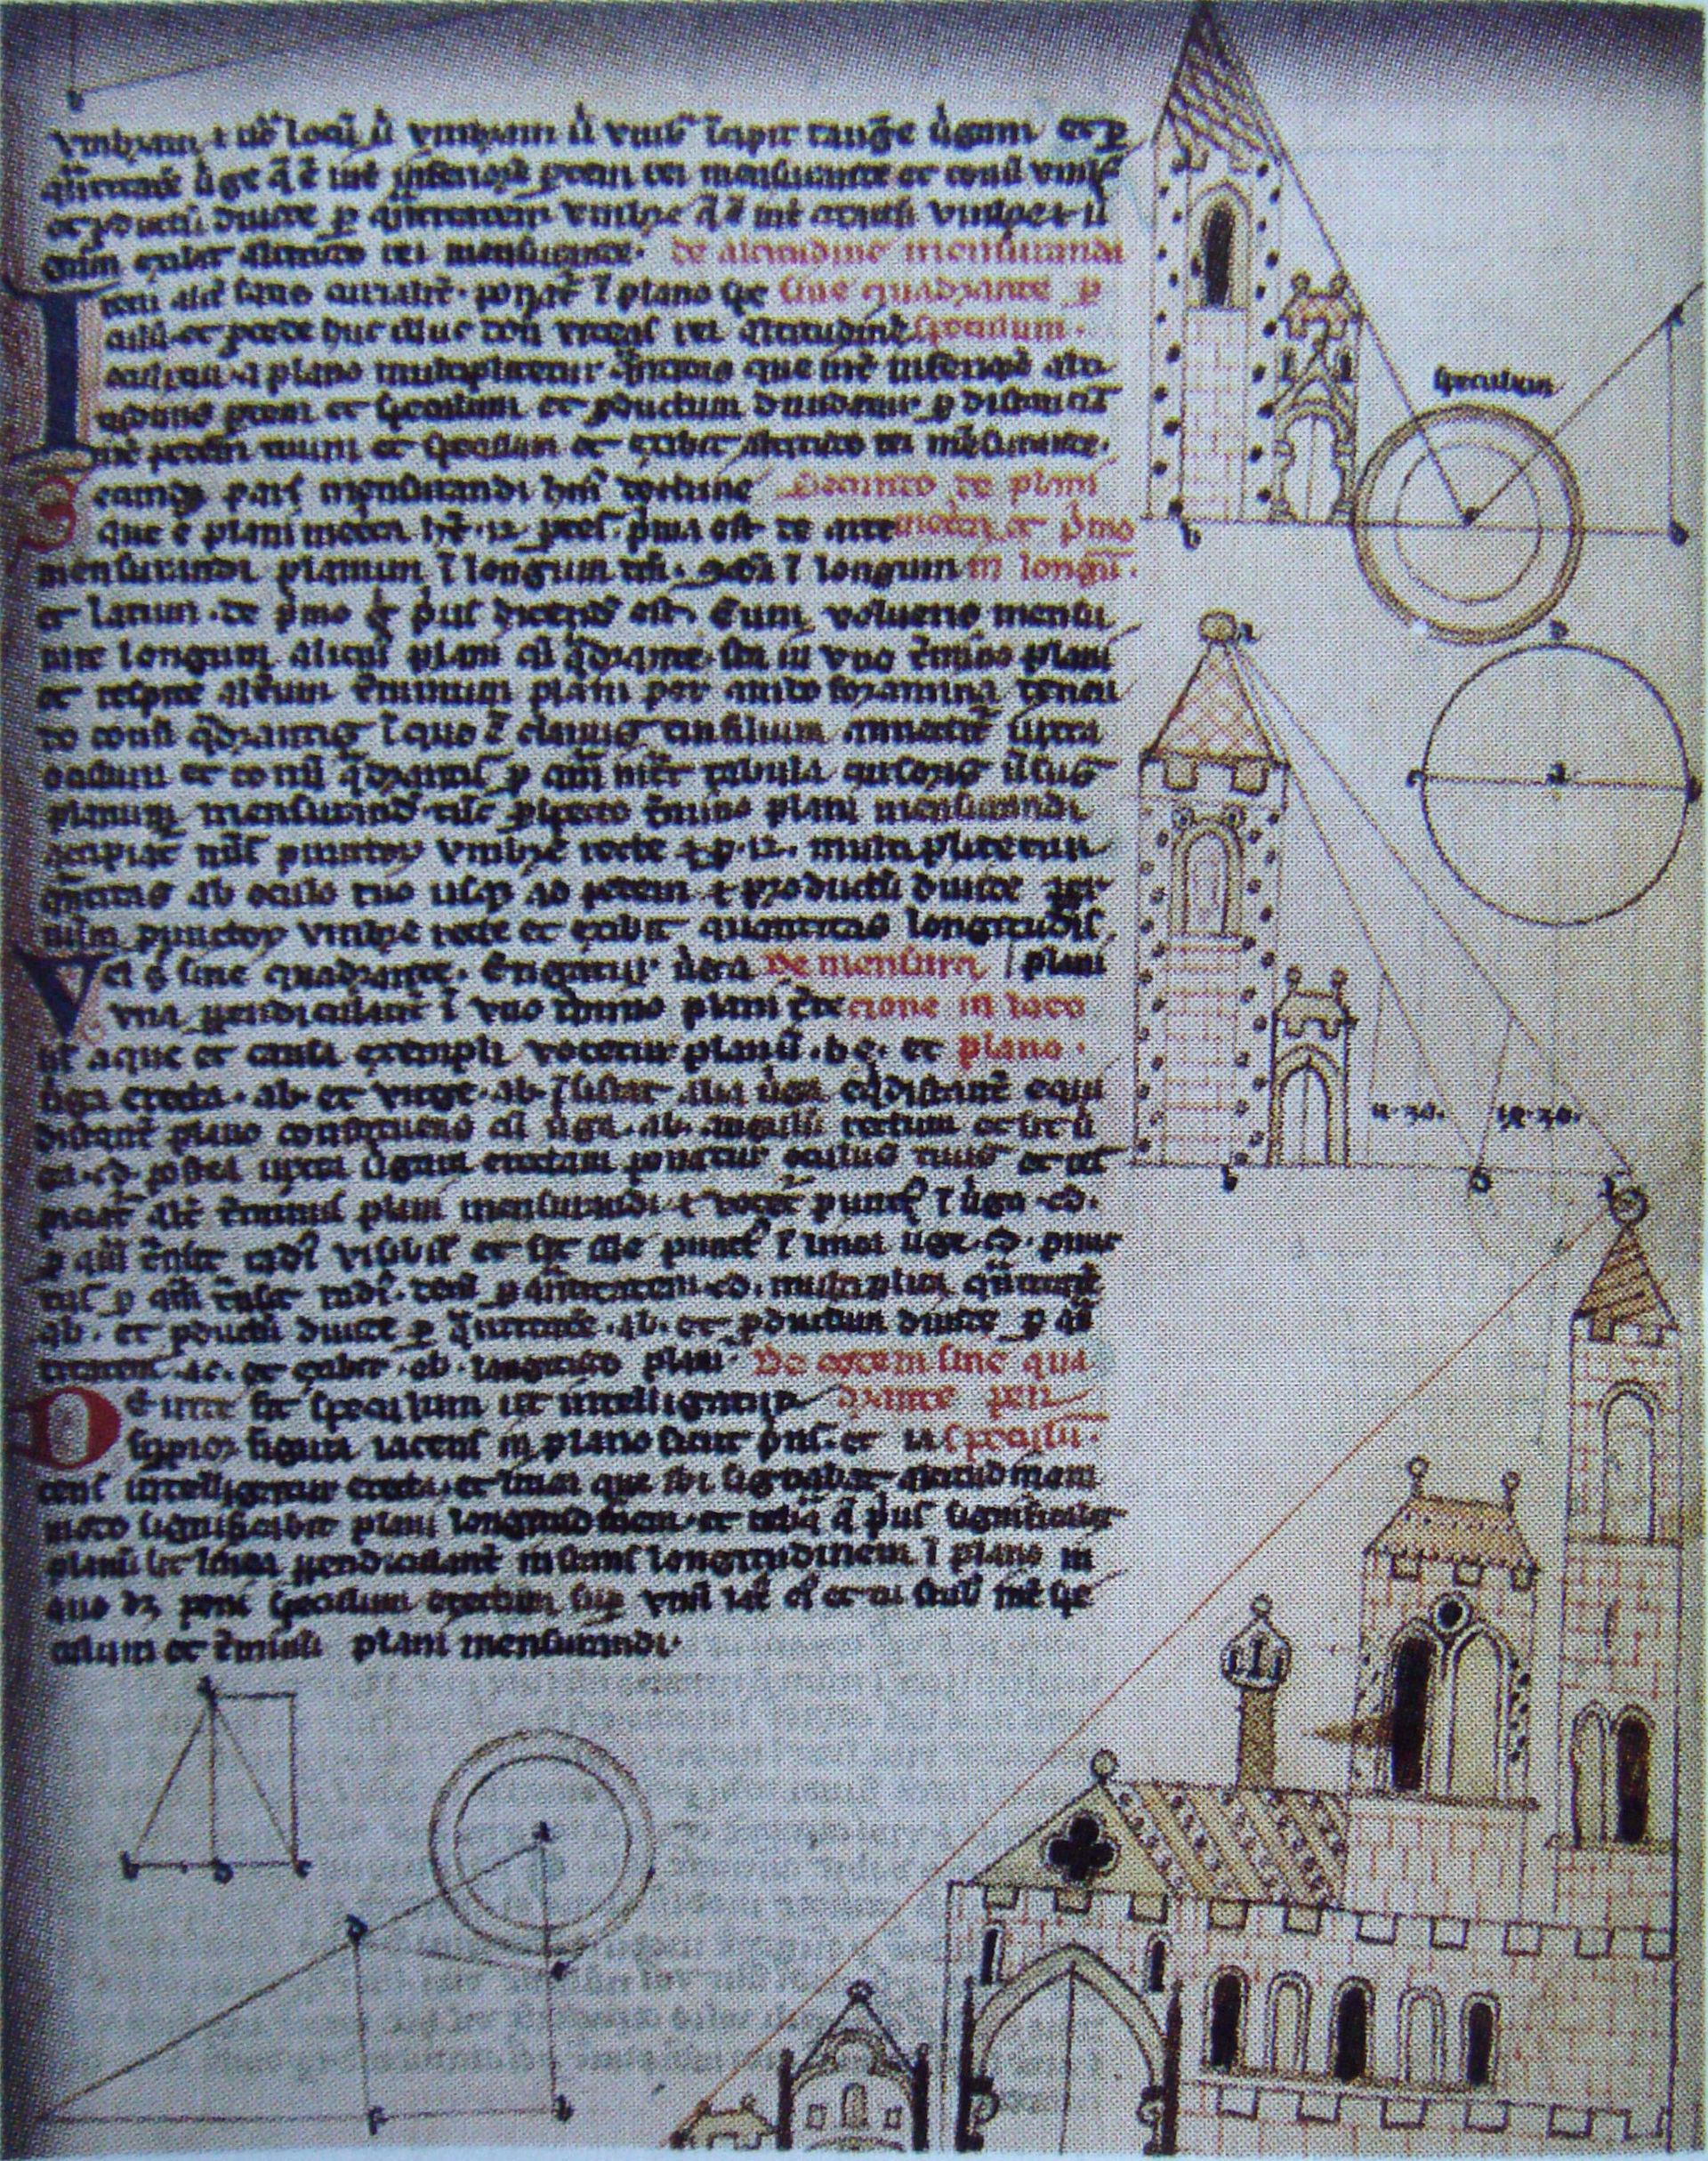 Theorica_Platenarum_by_Gerard_of_Cremona_13th_century